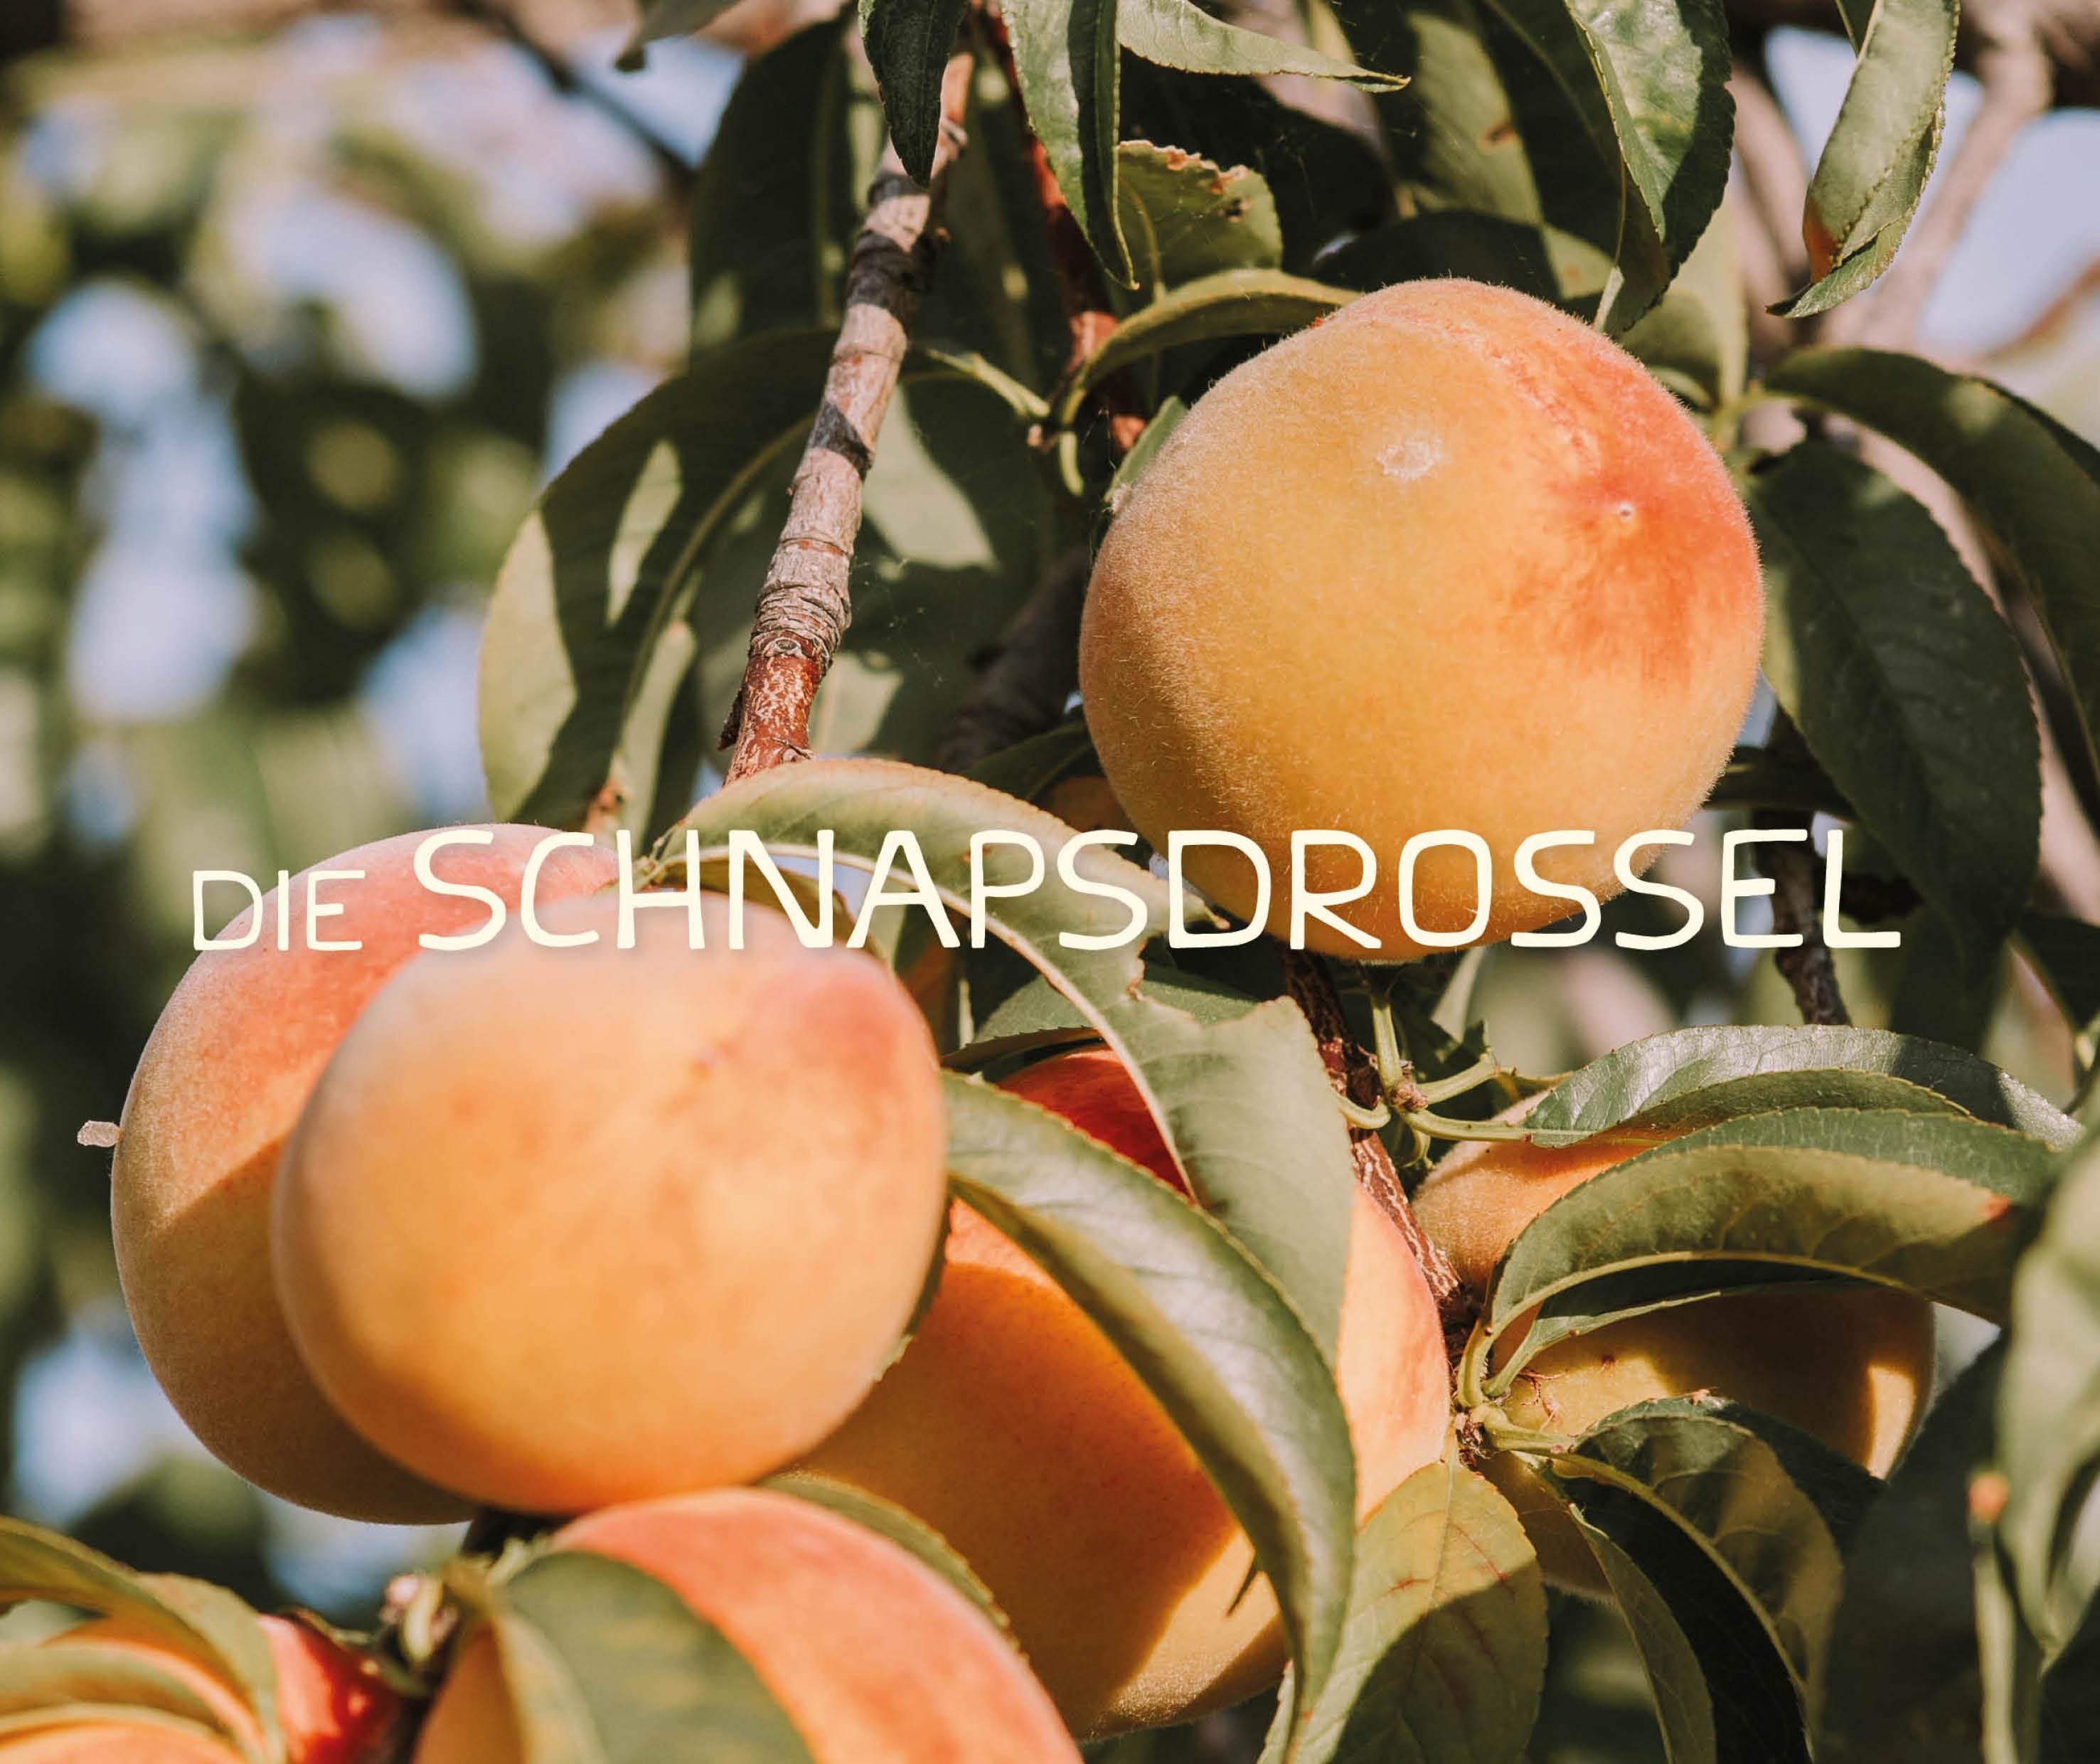 Die Schnapsdrossel Brand Identity (Handmade Typography) by Magdalena Weiss